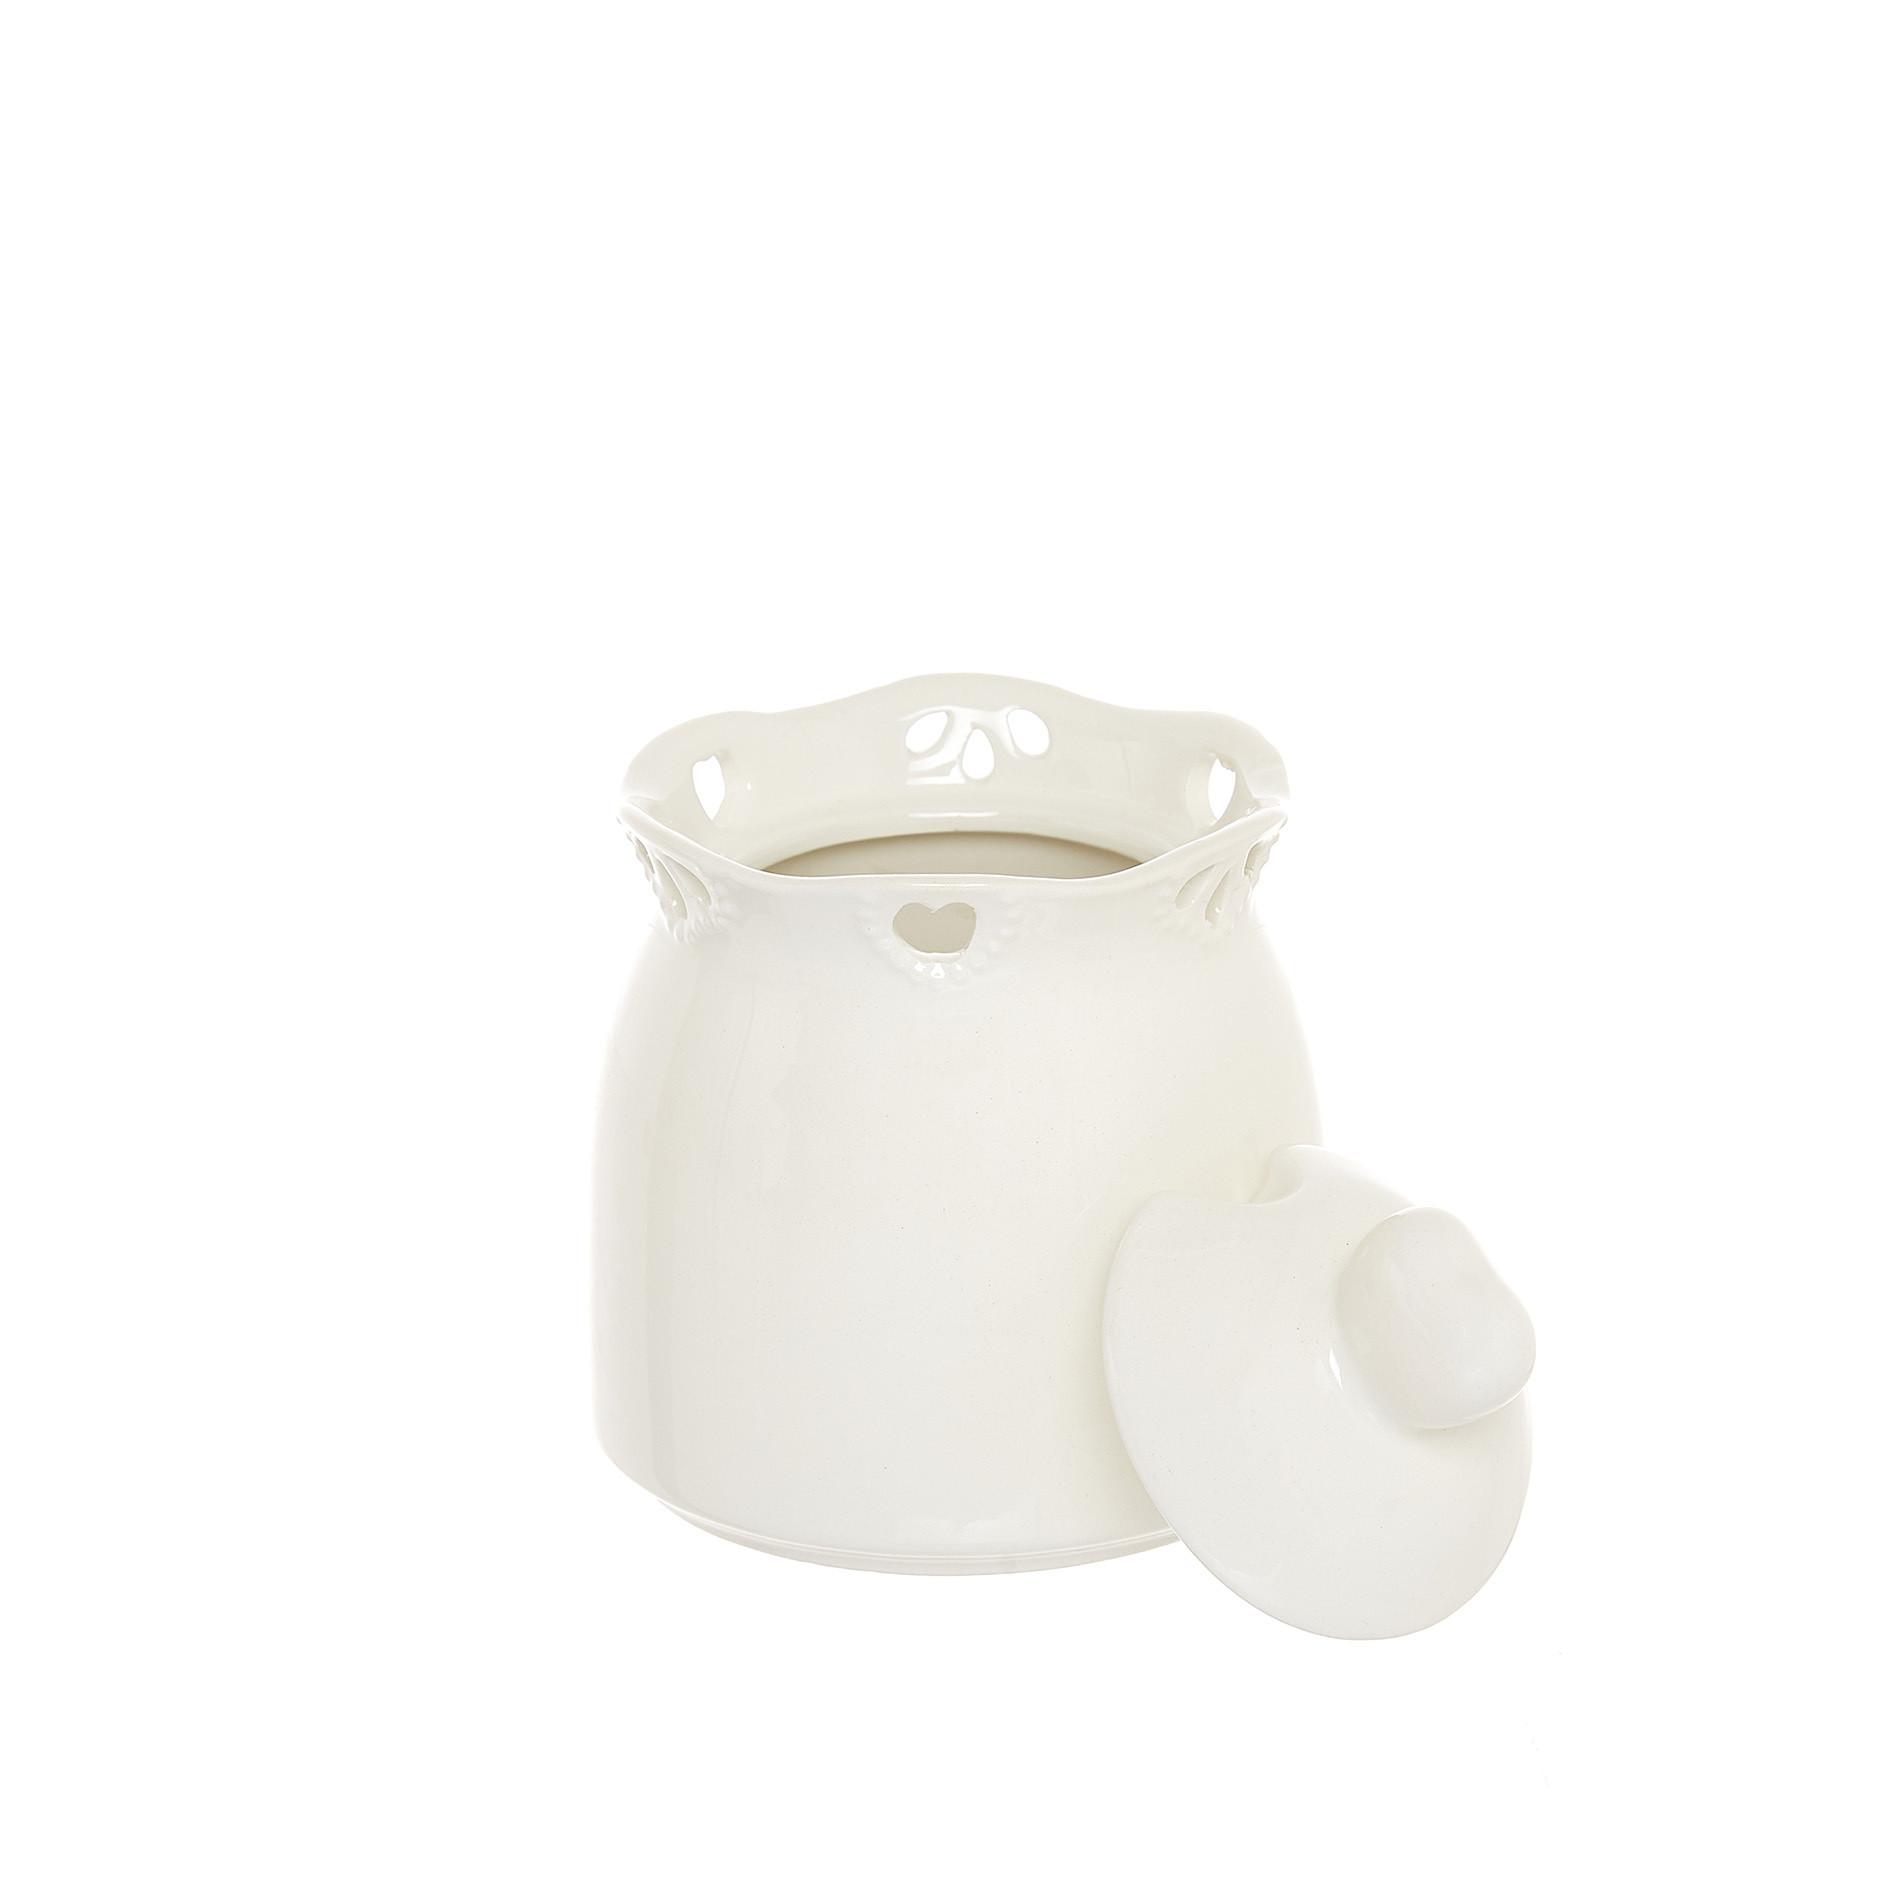 Zuccheriera ceramica traforata, Bianco, large image number 1